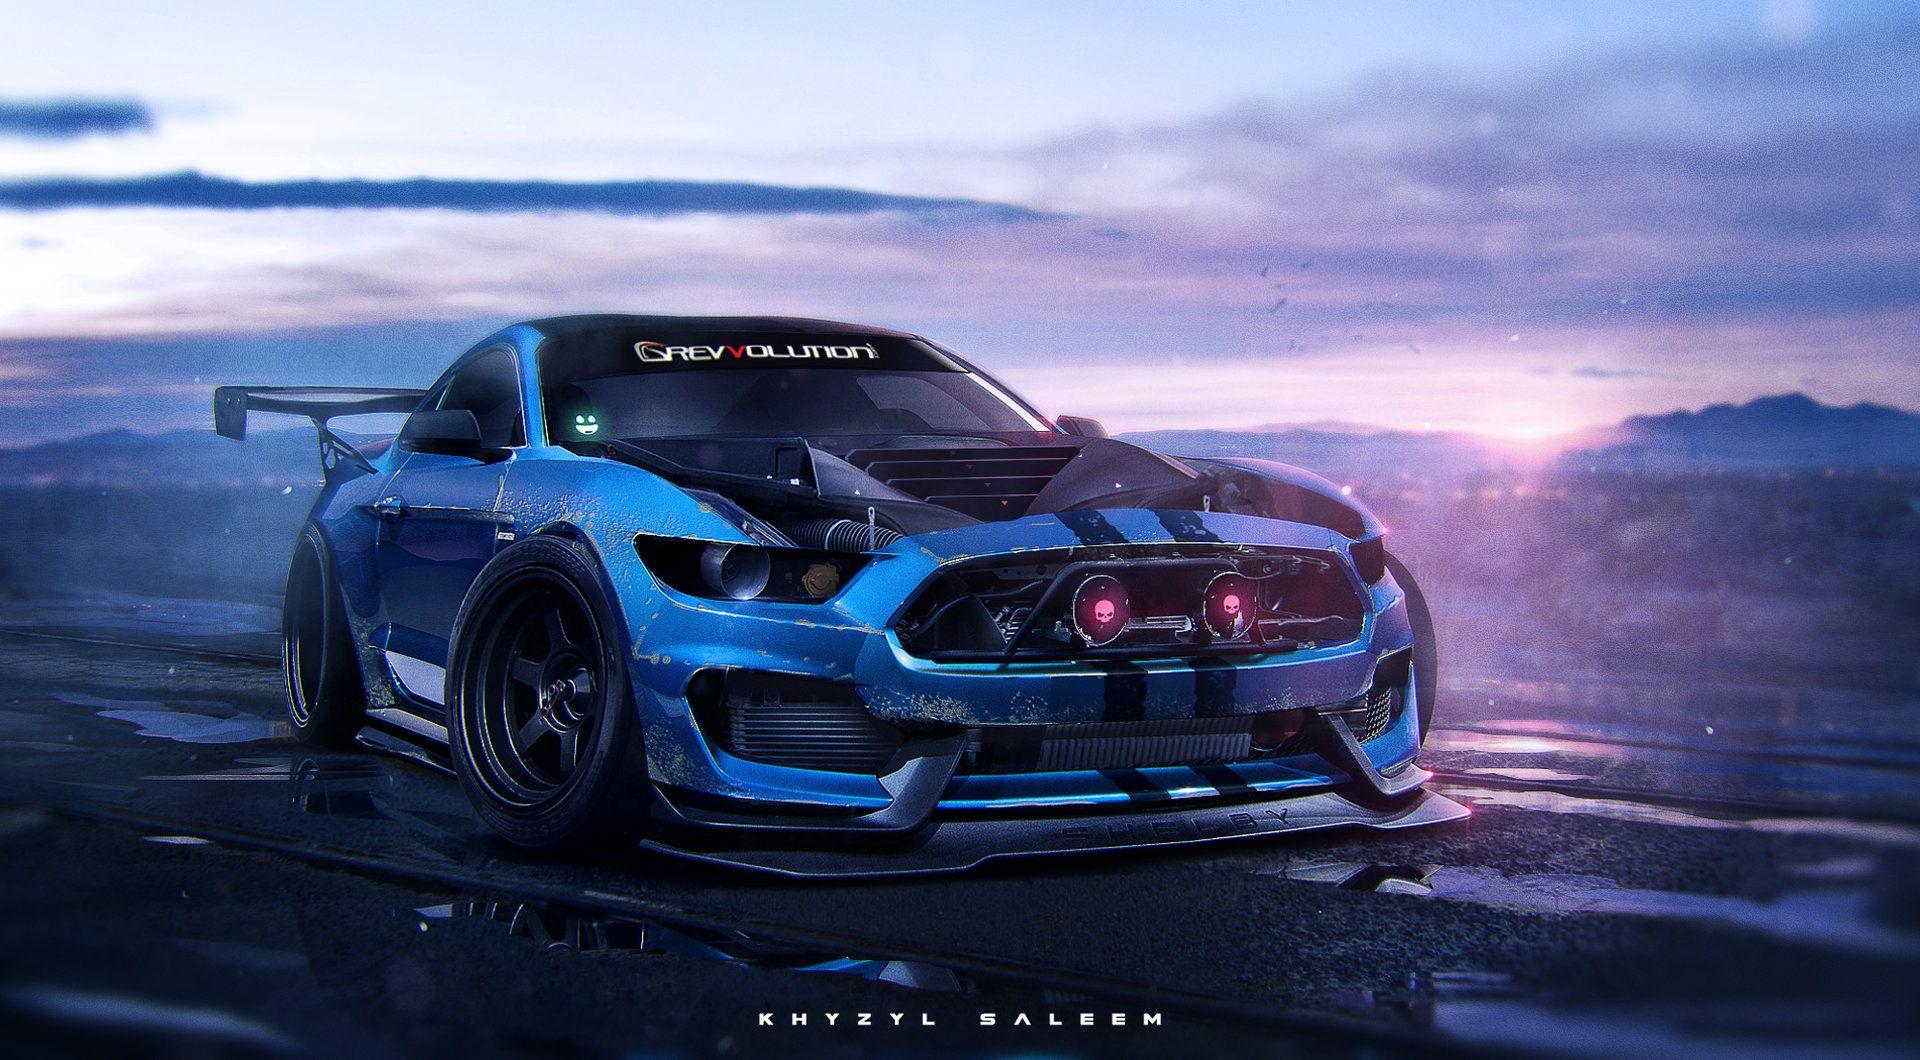 350arghh Khyzyl Saleem Sports Car Ford Mustang Shelby Mustang Wallpaper